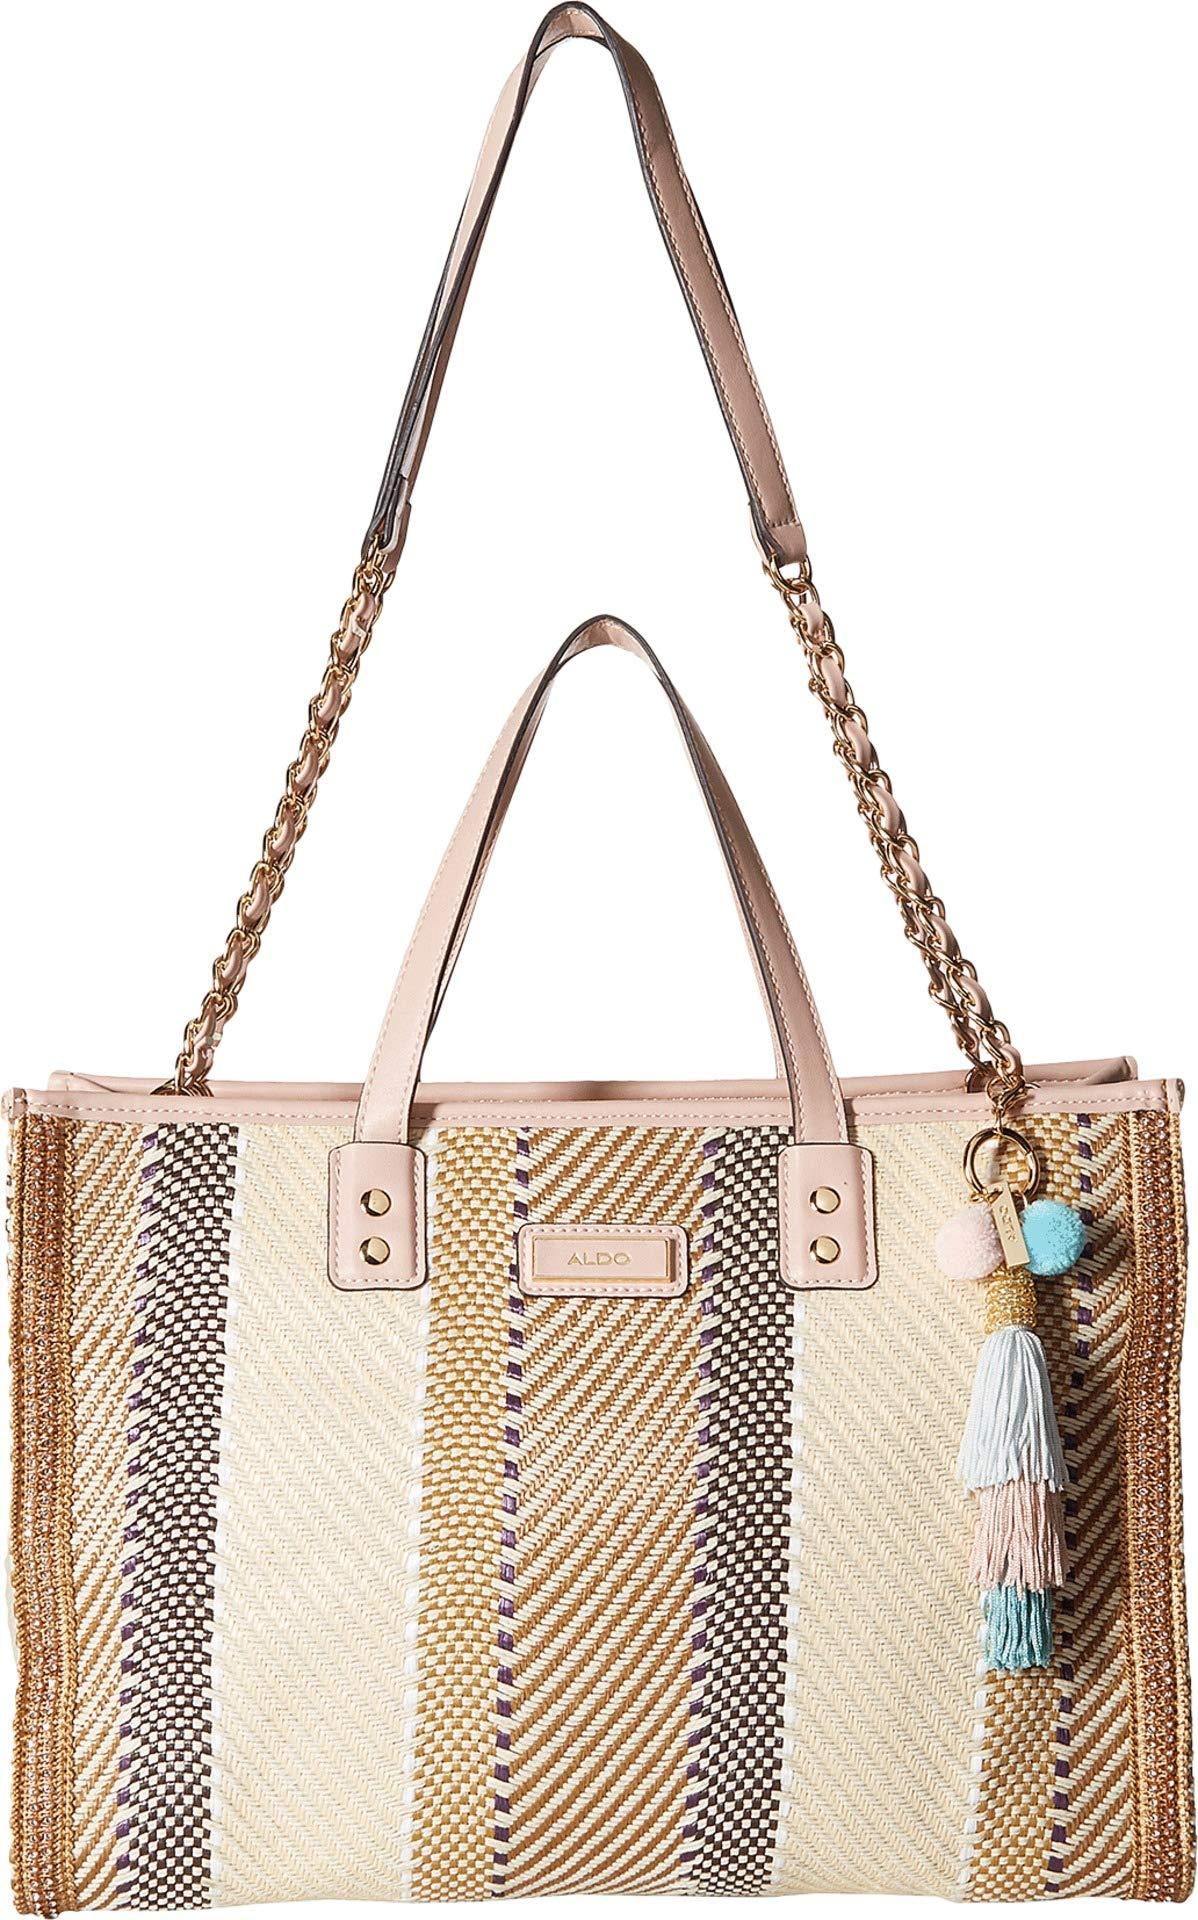 ویکالا · خرید  اصل اورجینال · خرید از آمازون · ALDO Women's Colpack Beige One Size wekala · ویکالا